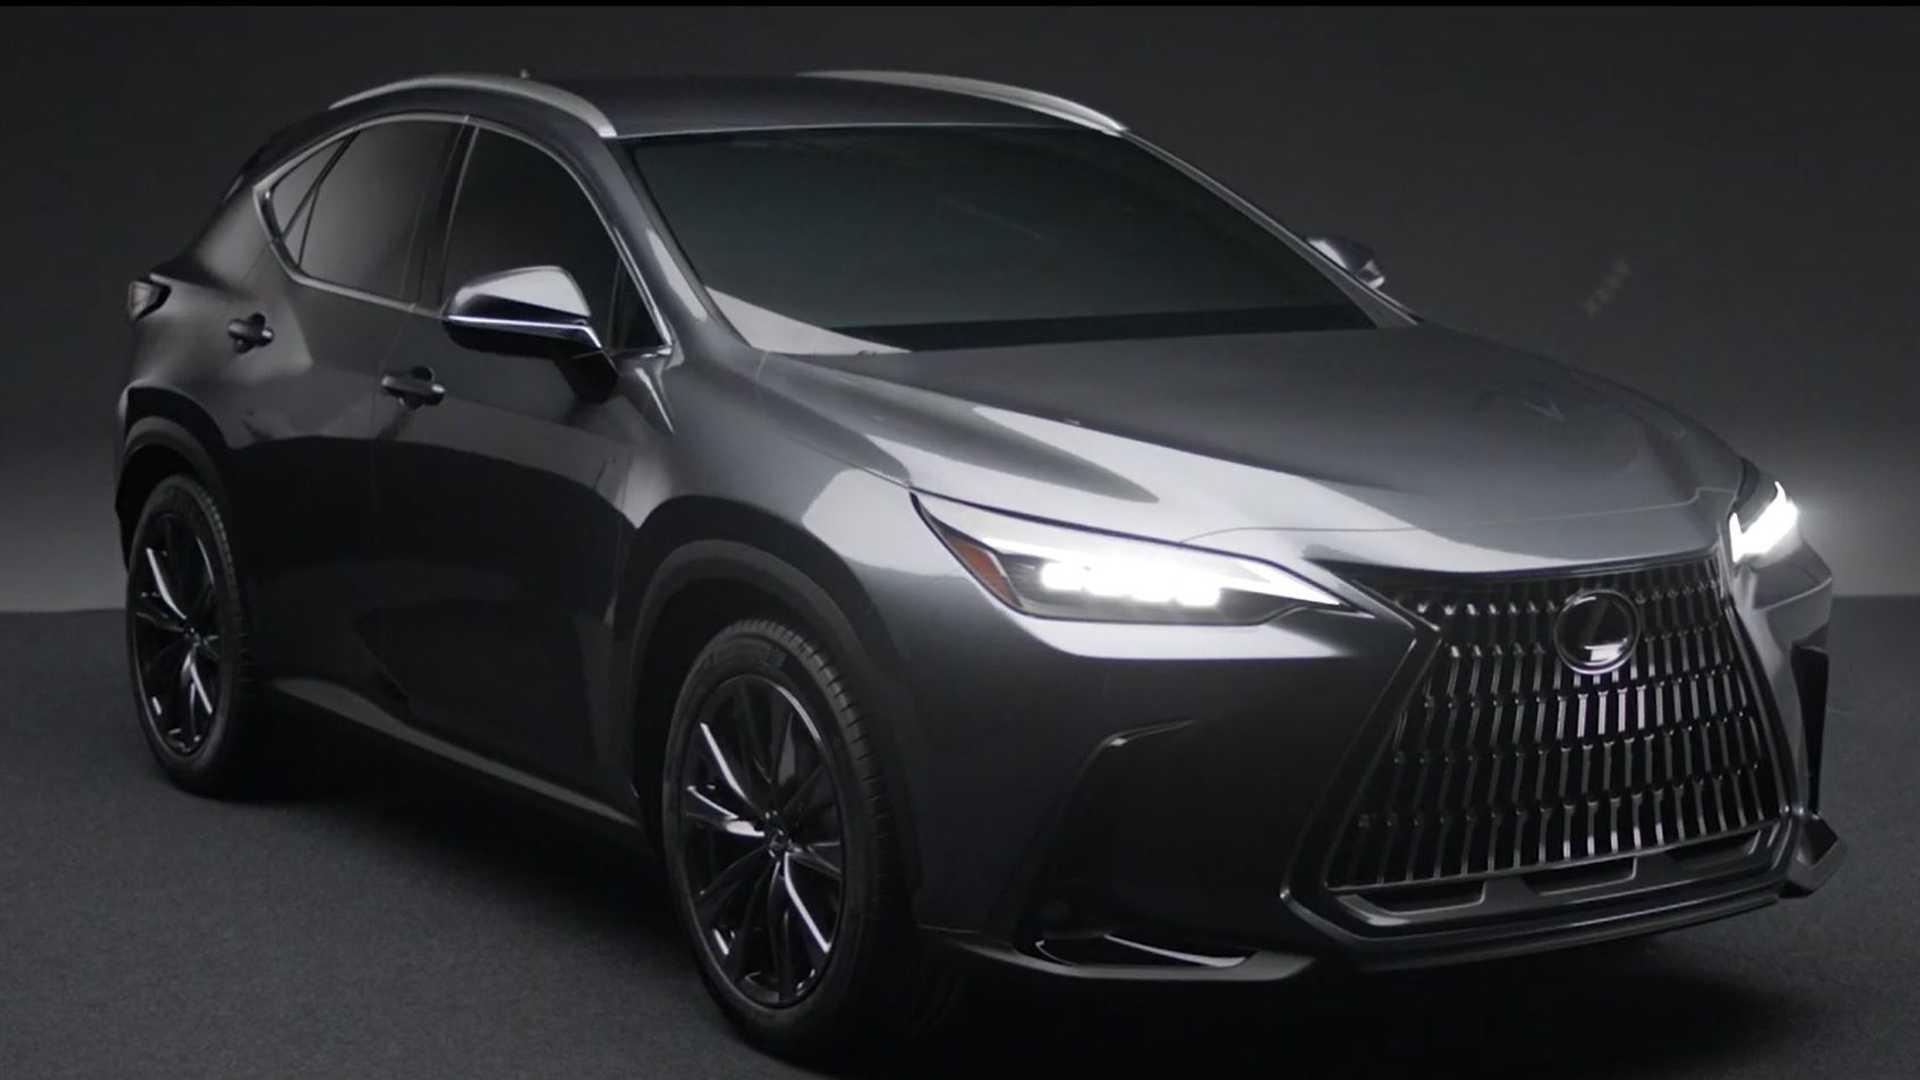 2022-lexus-nx-screenshot-from-leaked-official-video.jpg